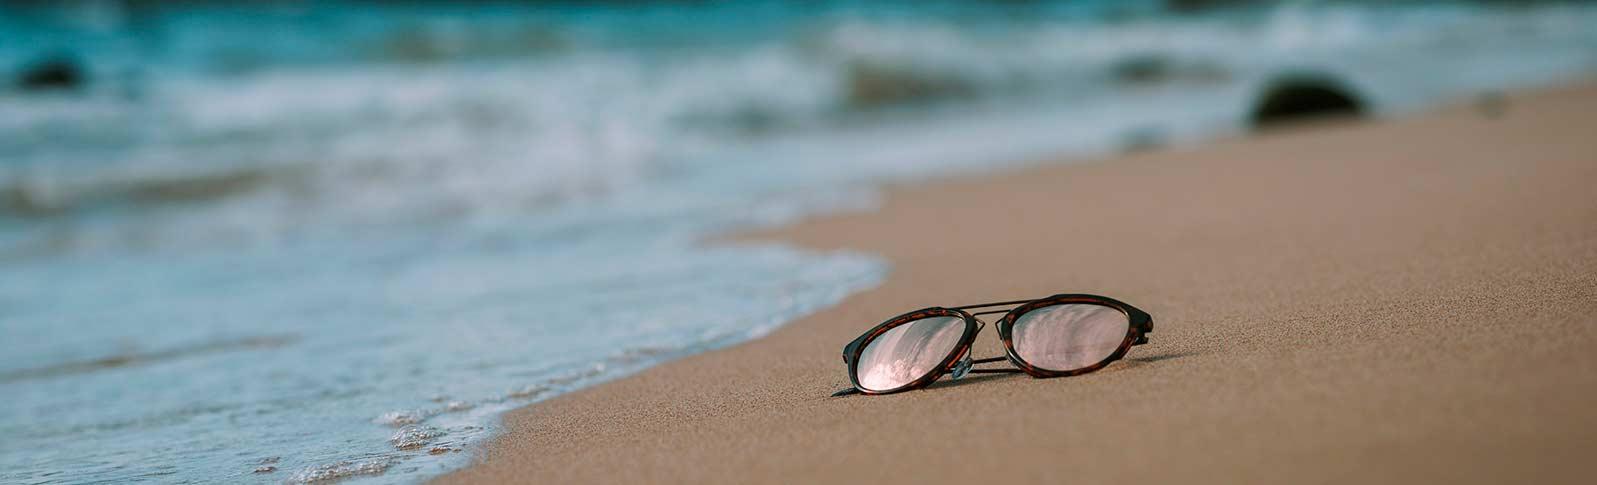 solbriller som ligger på en strand